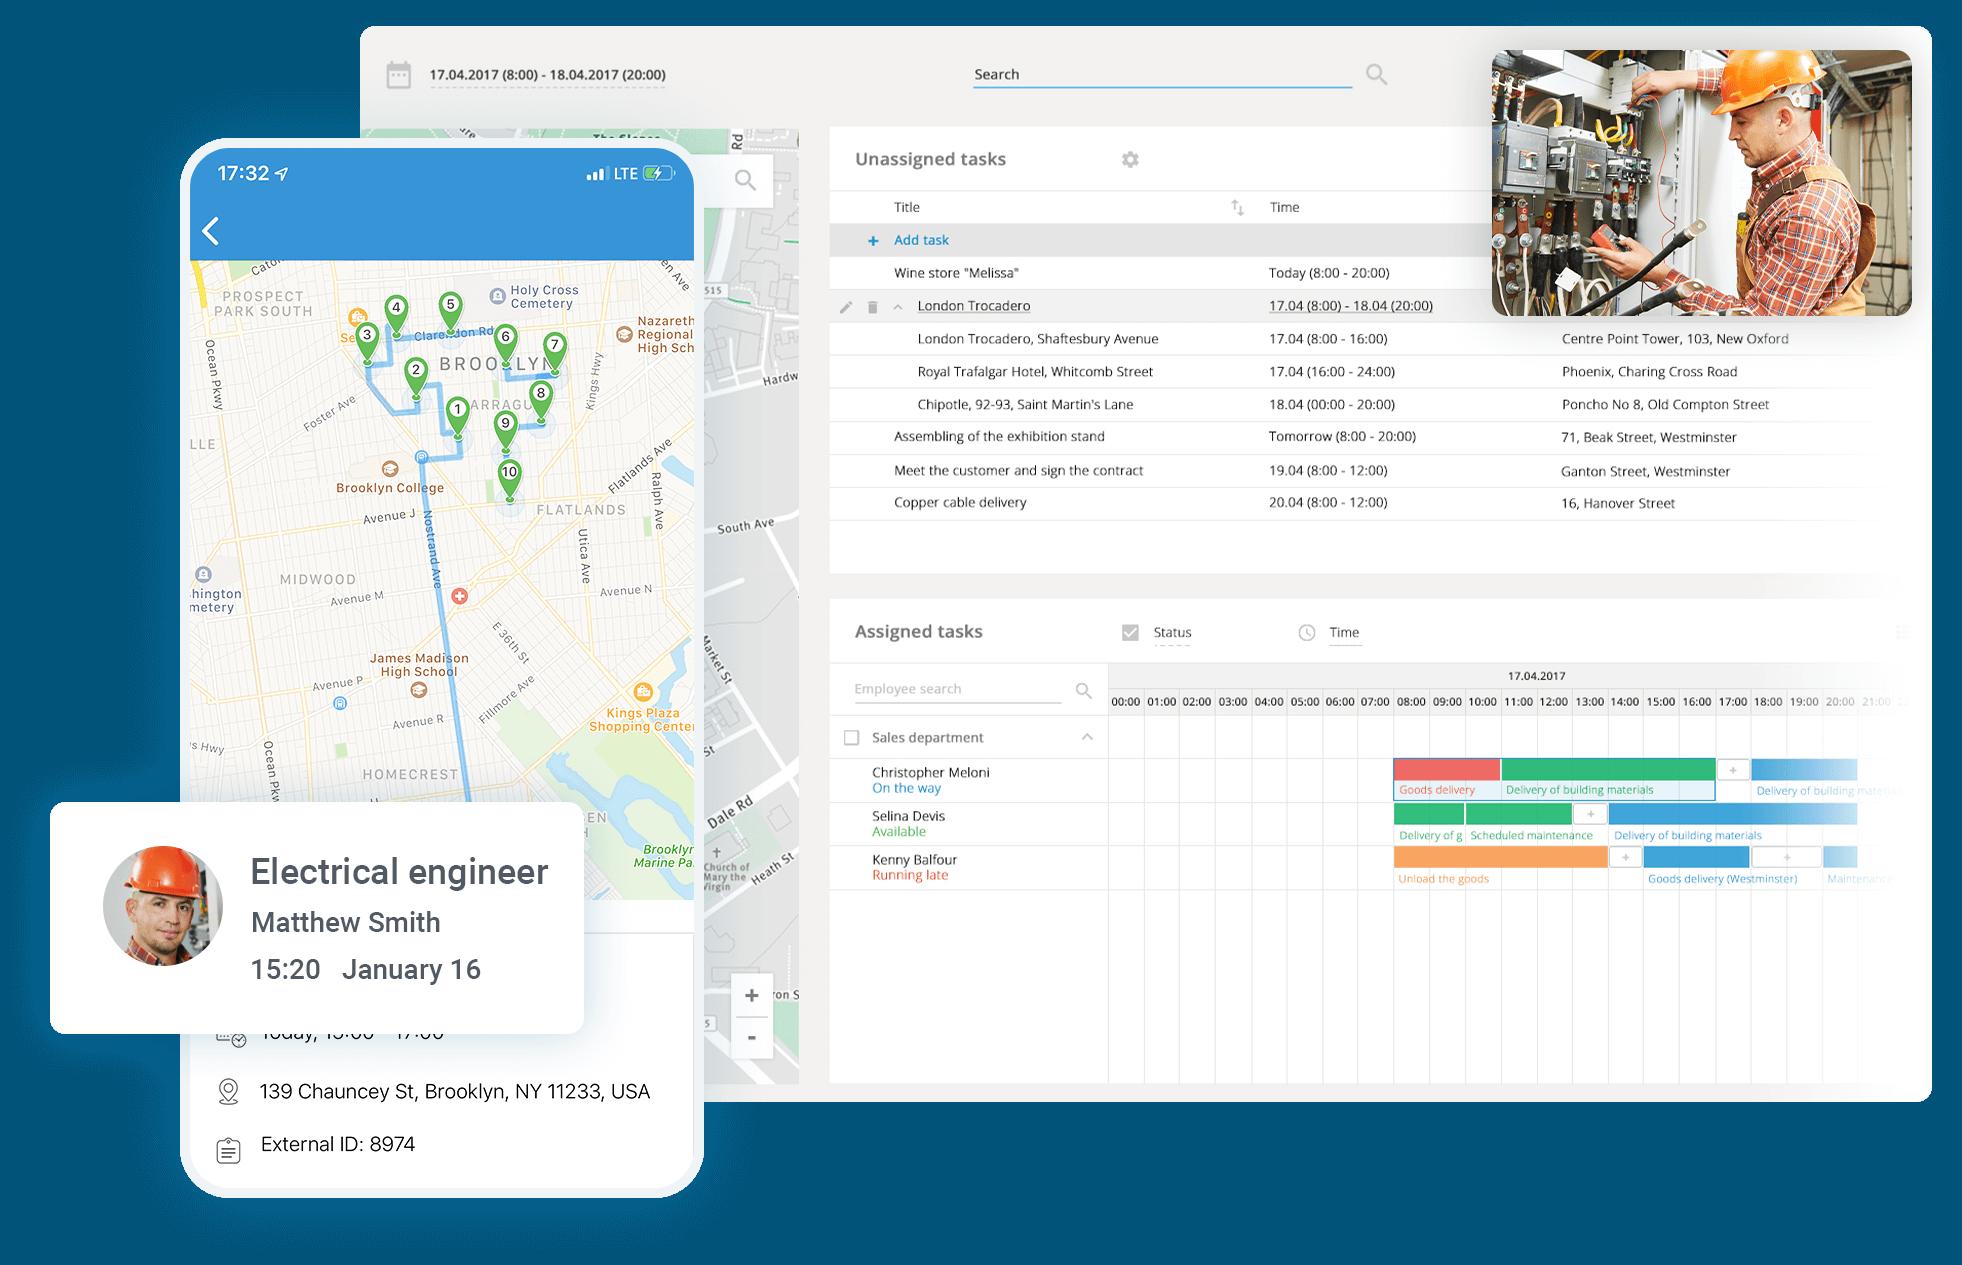 Electrician Service Software: Invoice, Estimate, Schedule & Dispatch